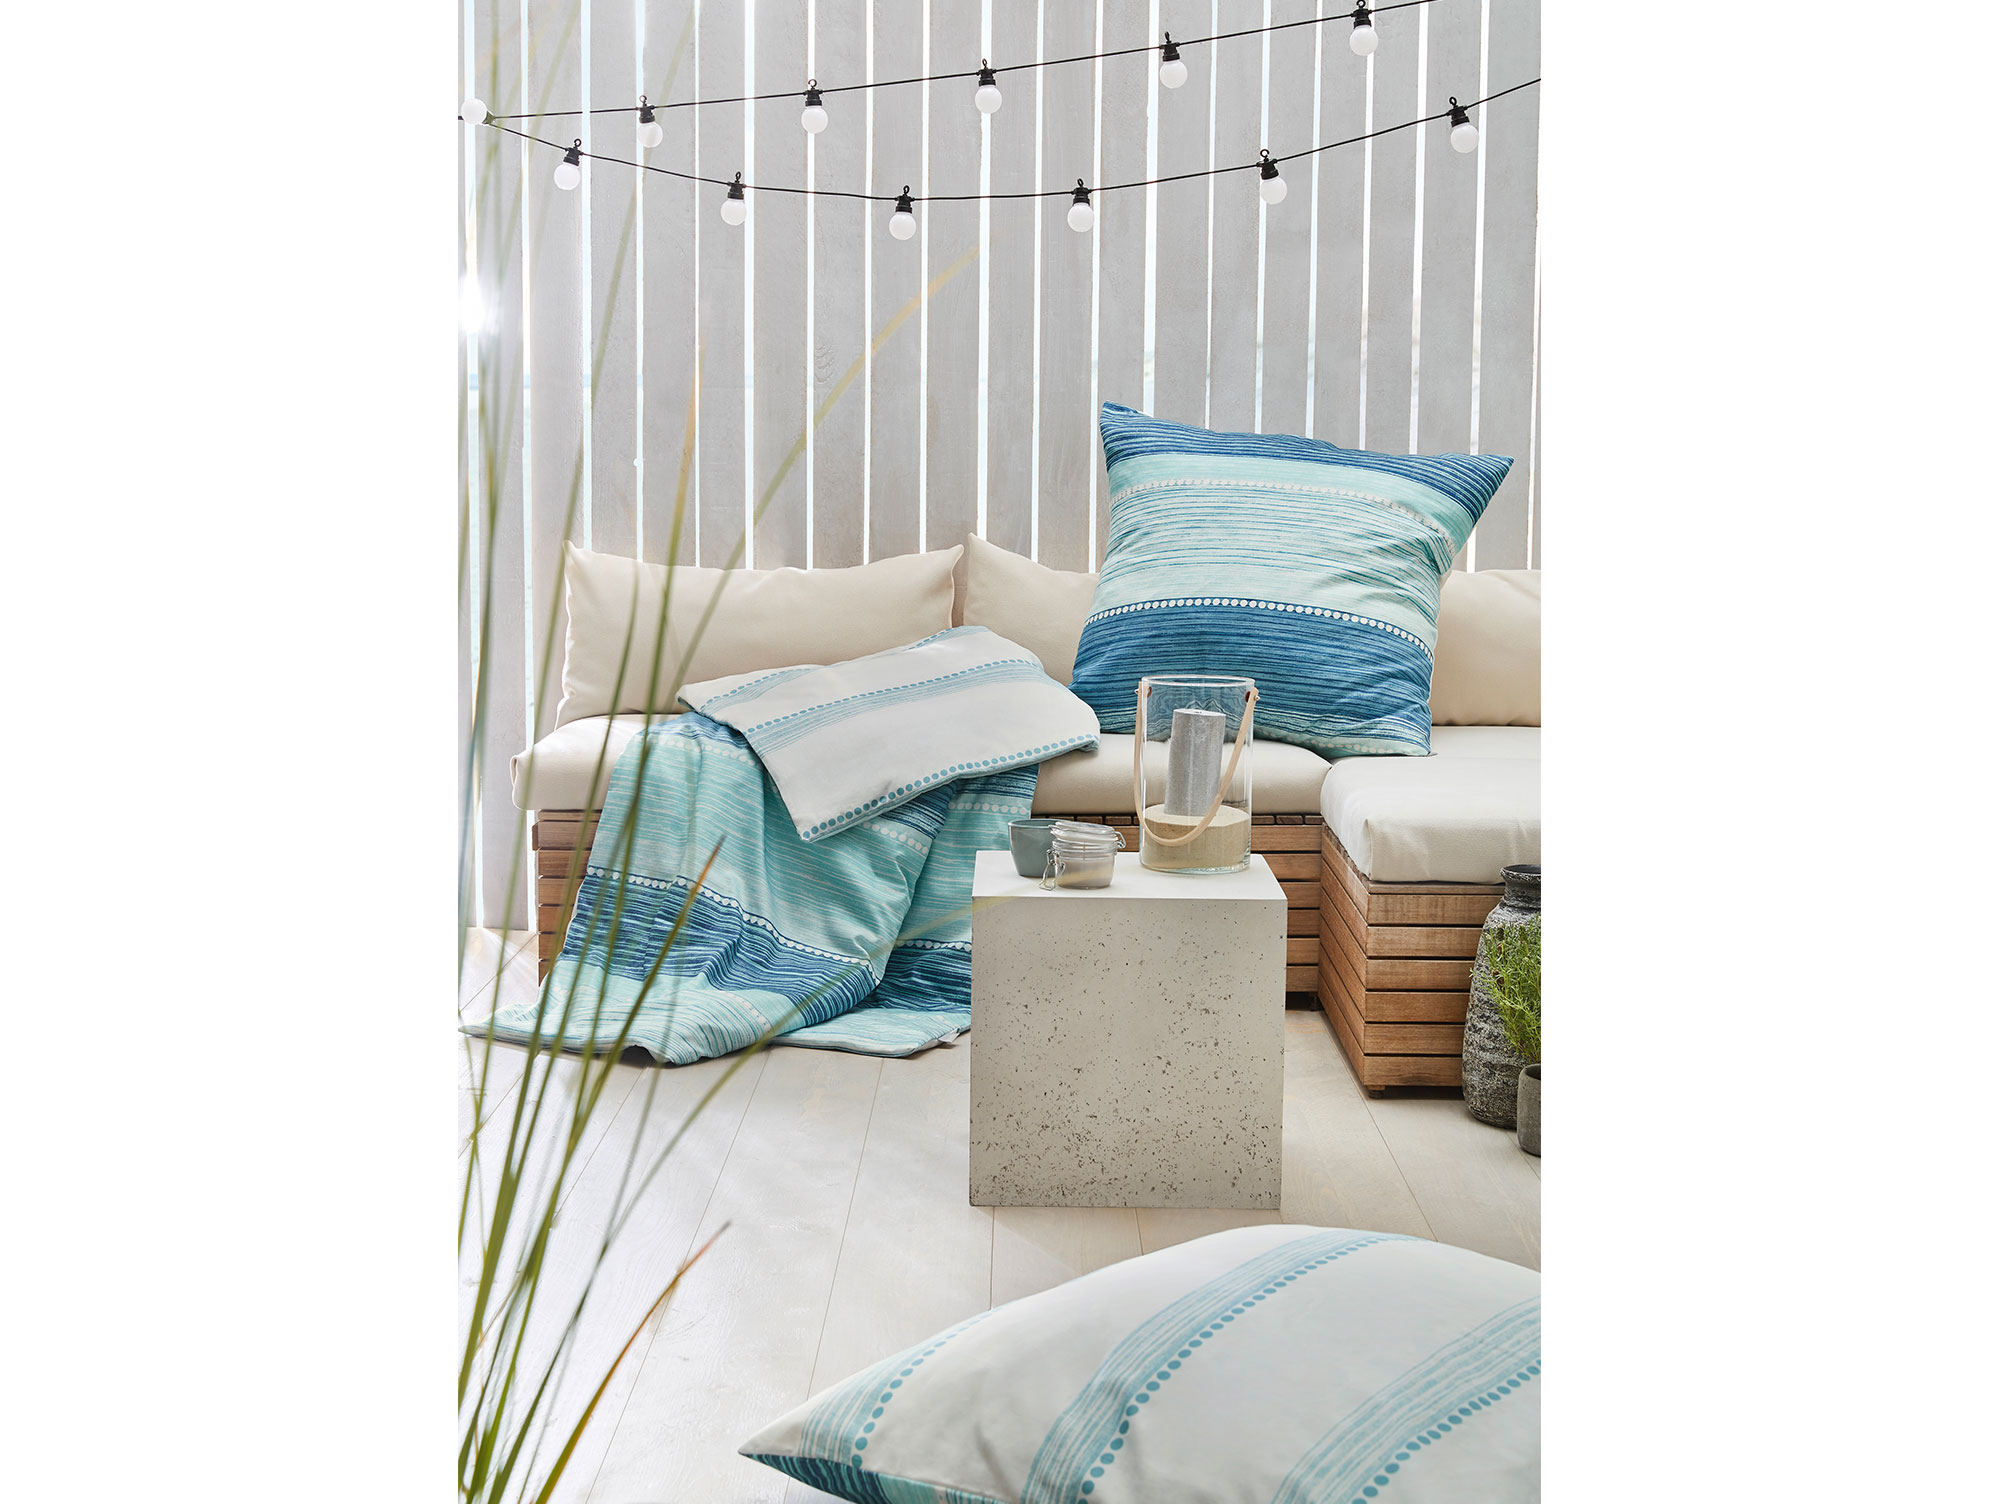 mako satin bettw sche delft 135x200 80x80 cm. Black Bedroom Furniture Sets. Home Design Ideas